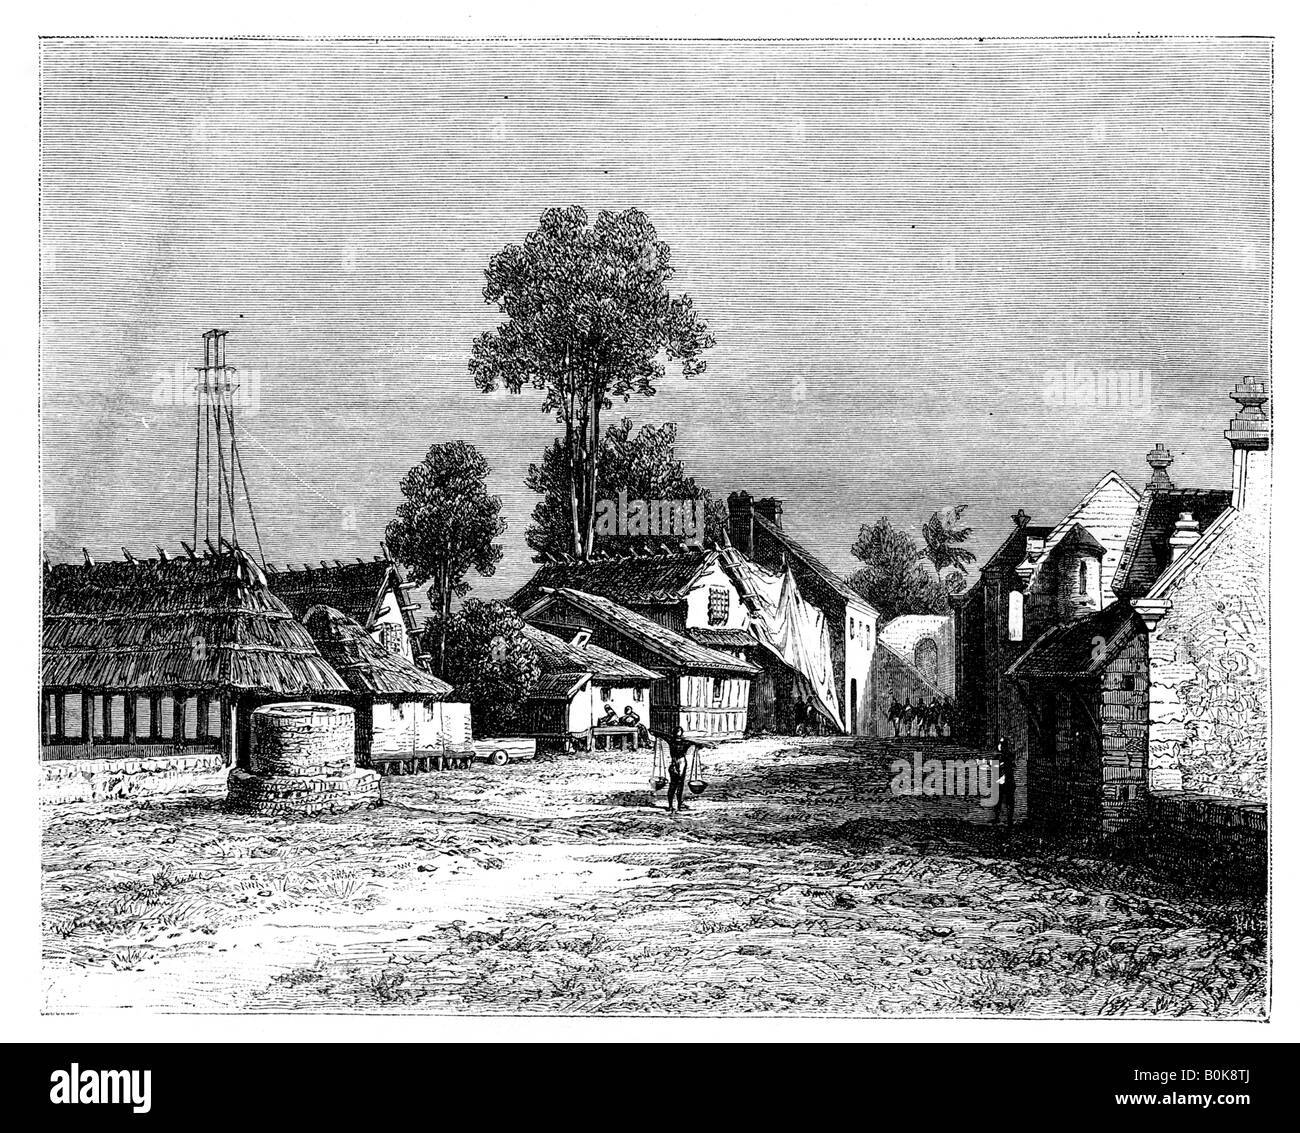 A street of Macassar, Celebes, Indonesia, 19th century. Artist: Hubert Clerget - Stock Image